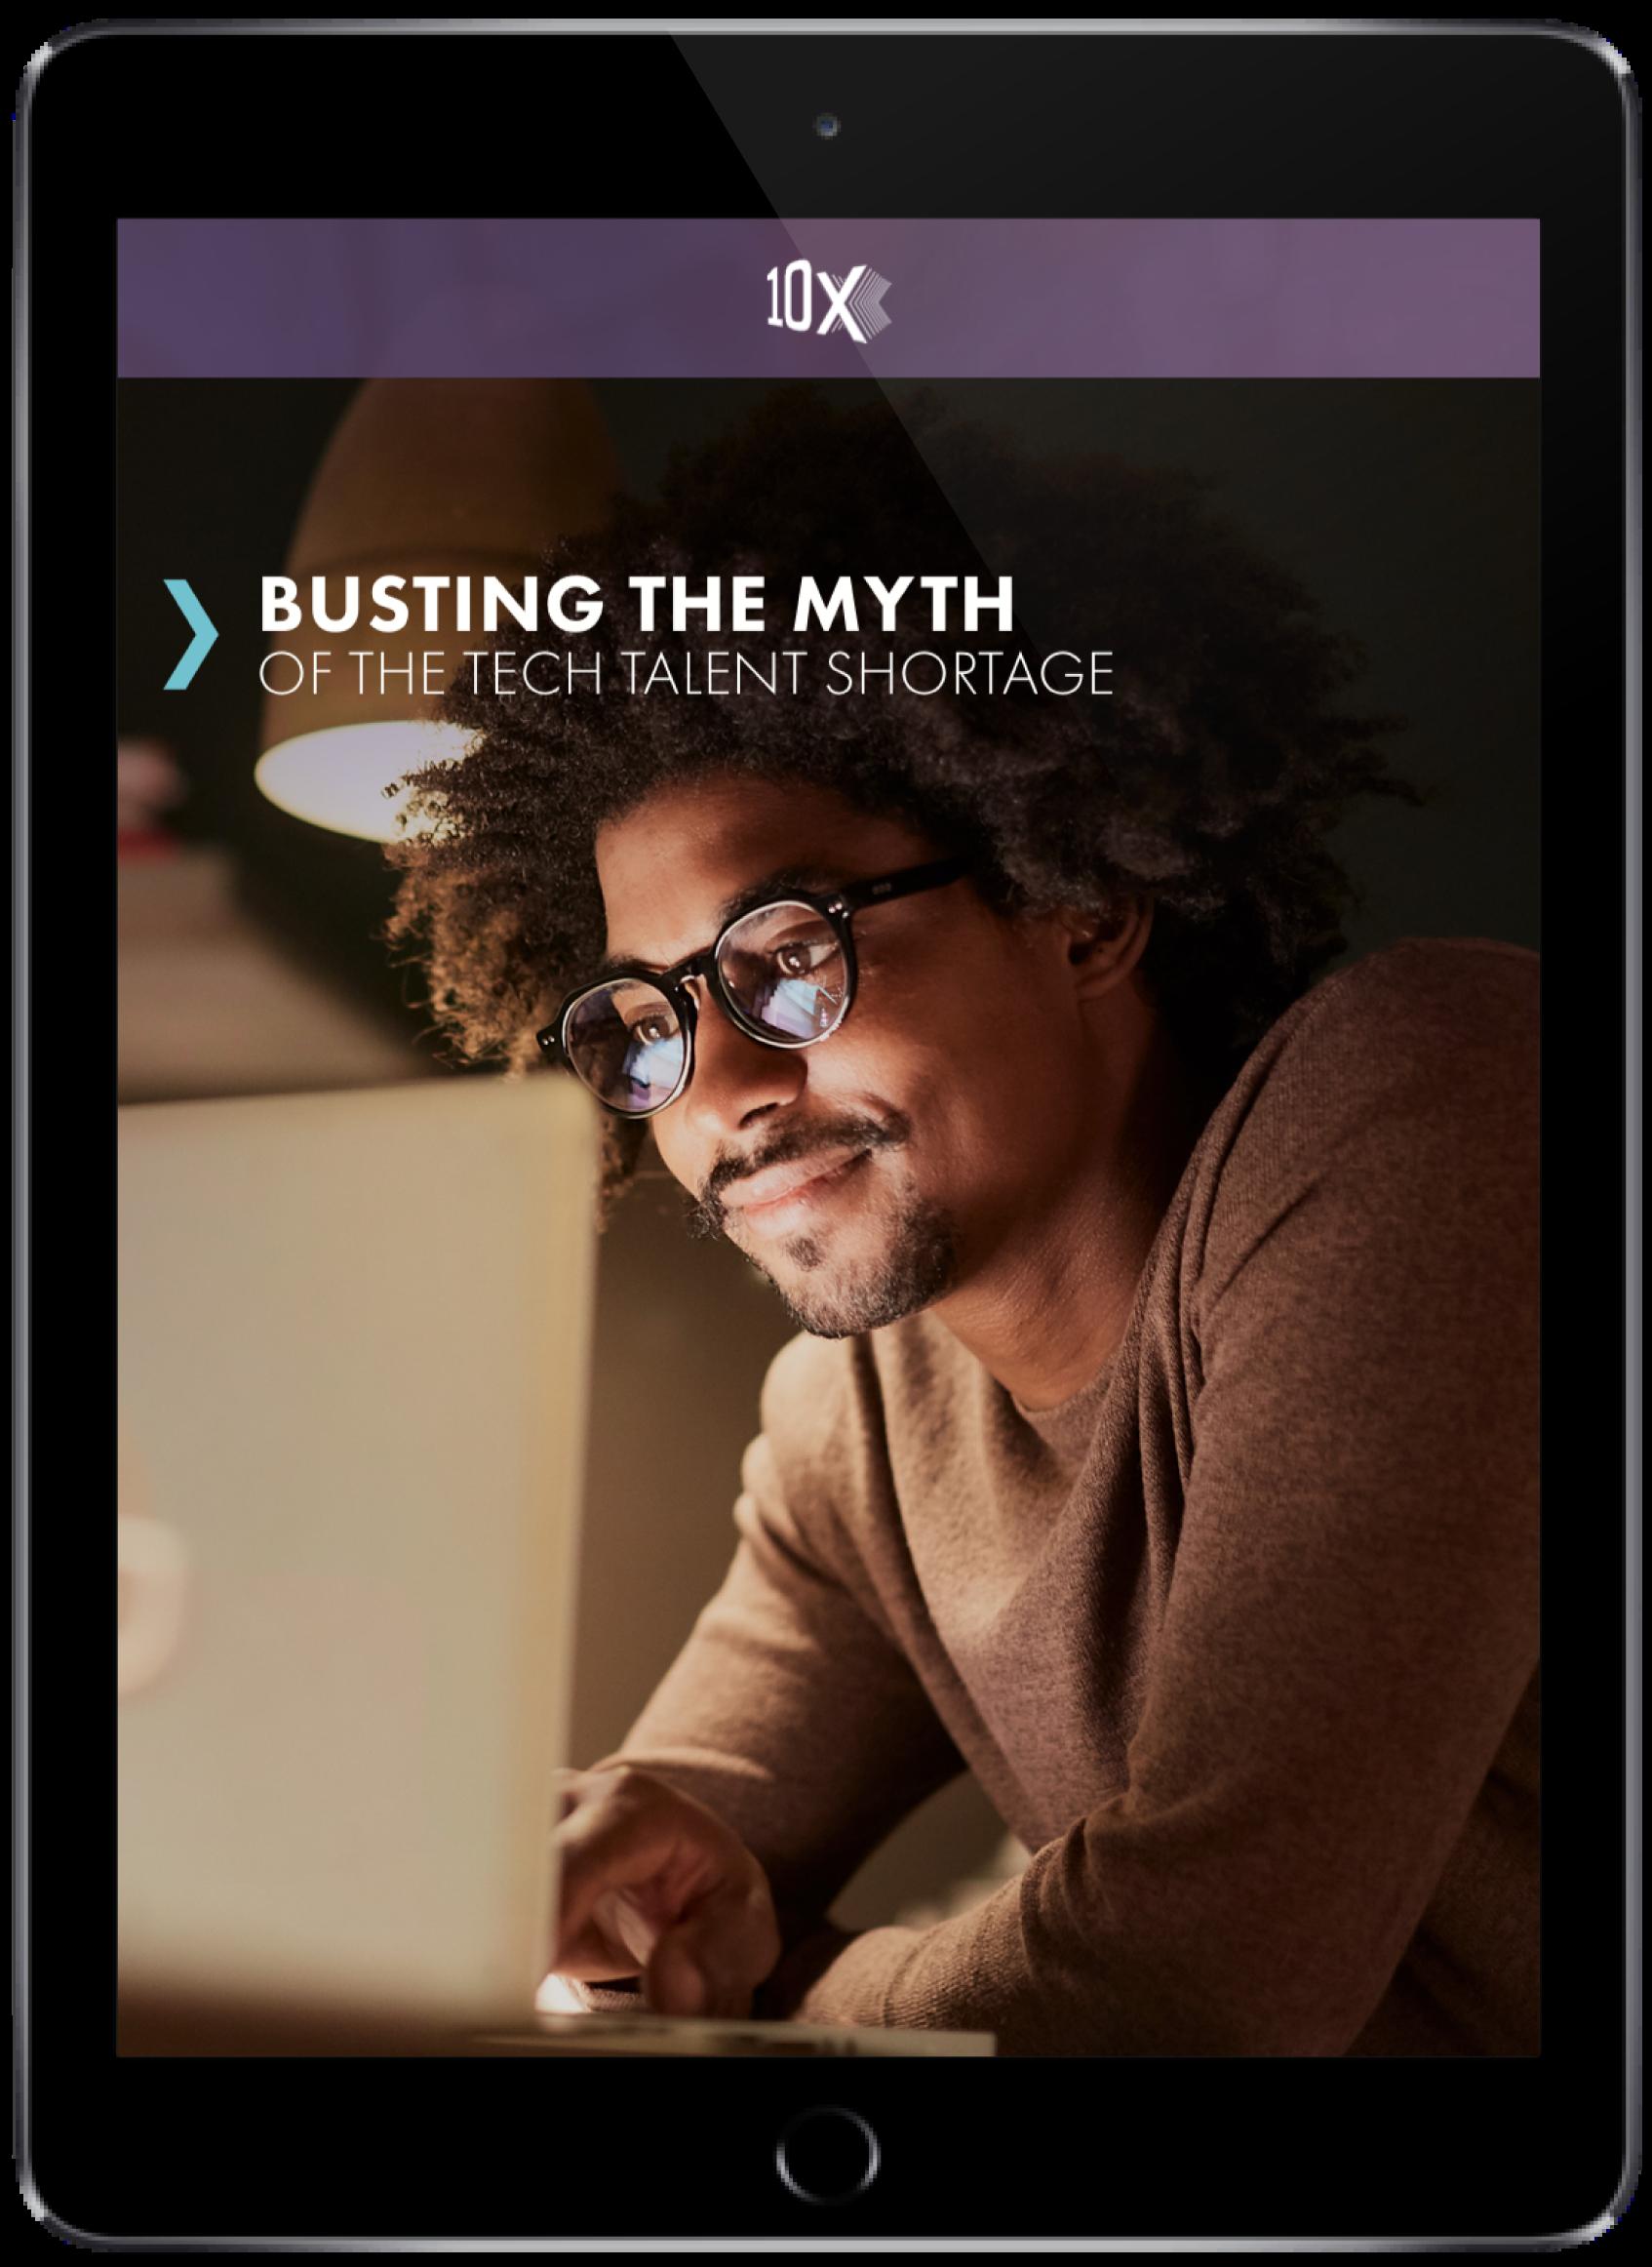 busting-the-myth-ipad